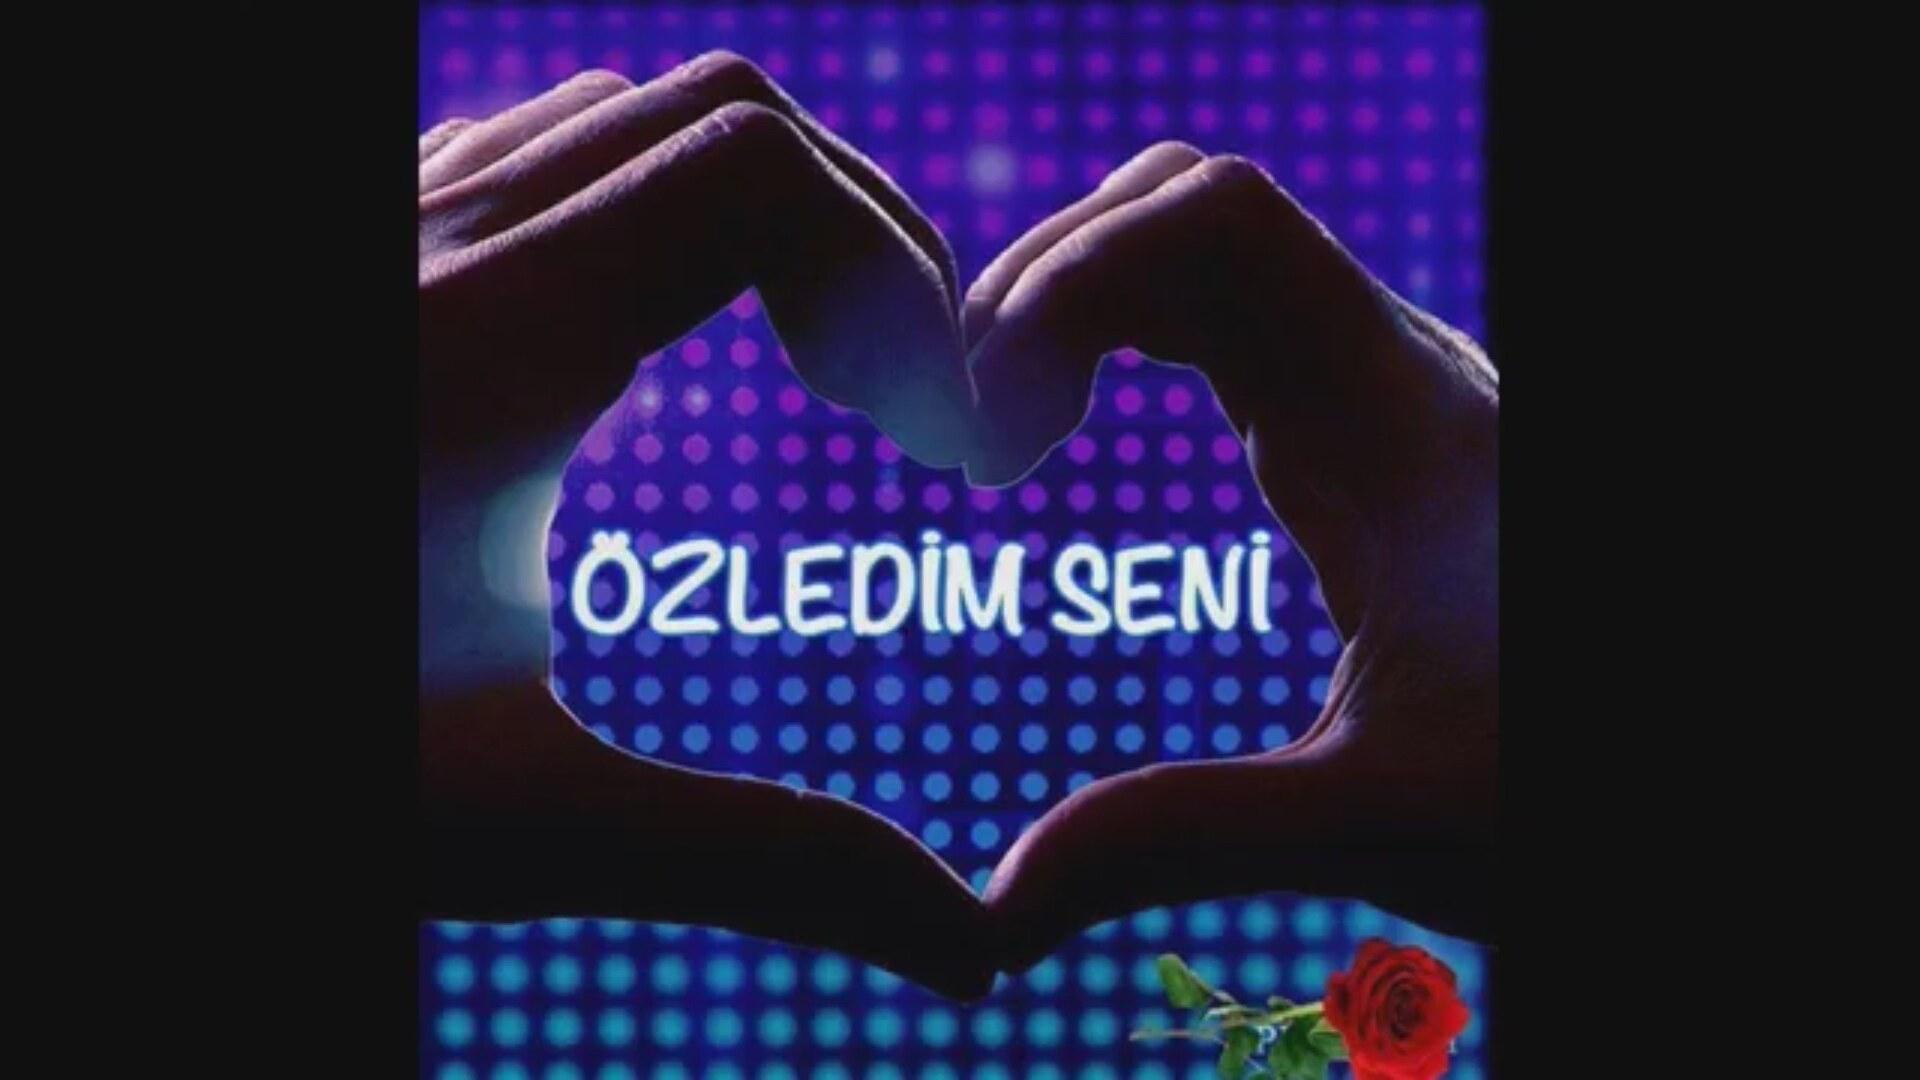 Картинки скучаю по тебе на турецком языке